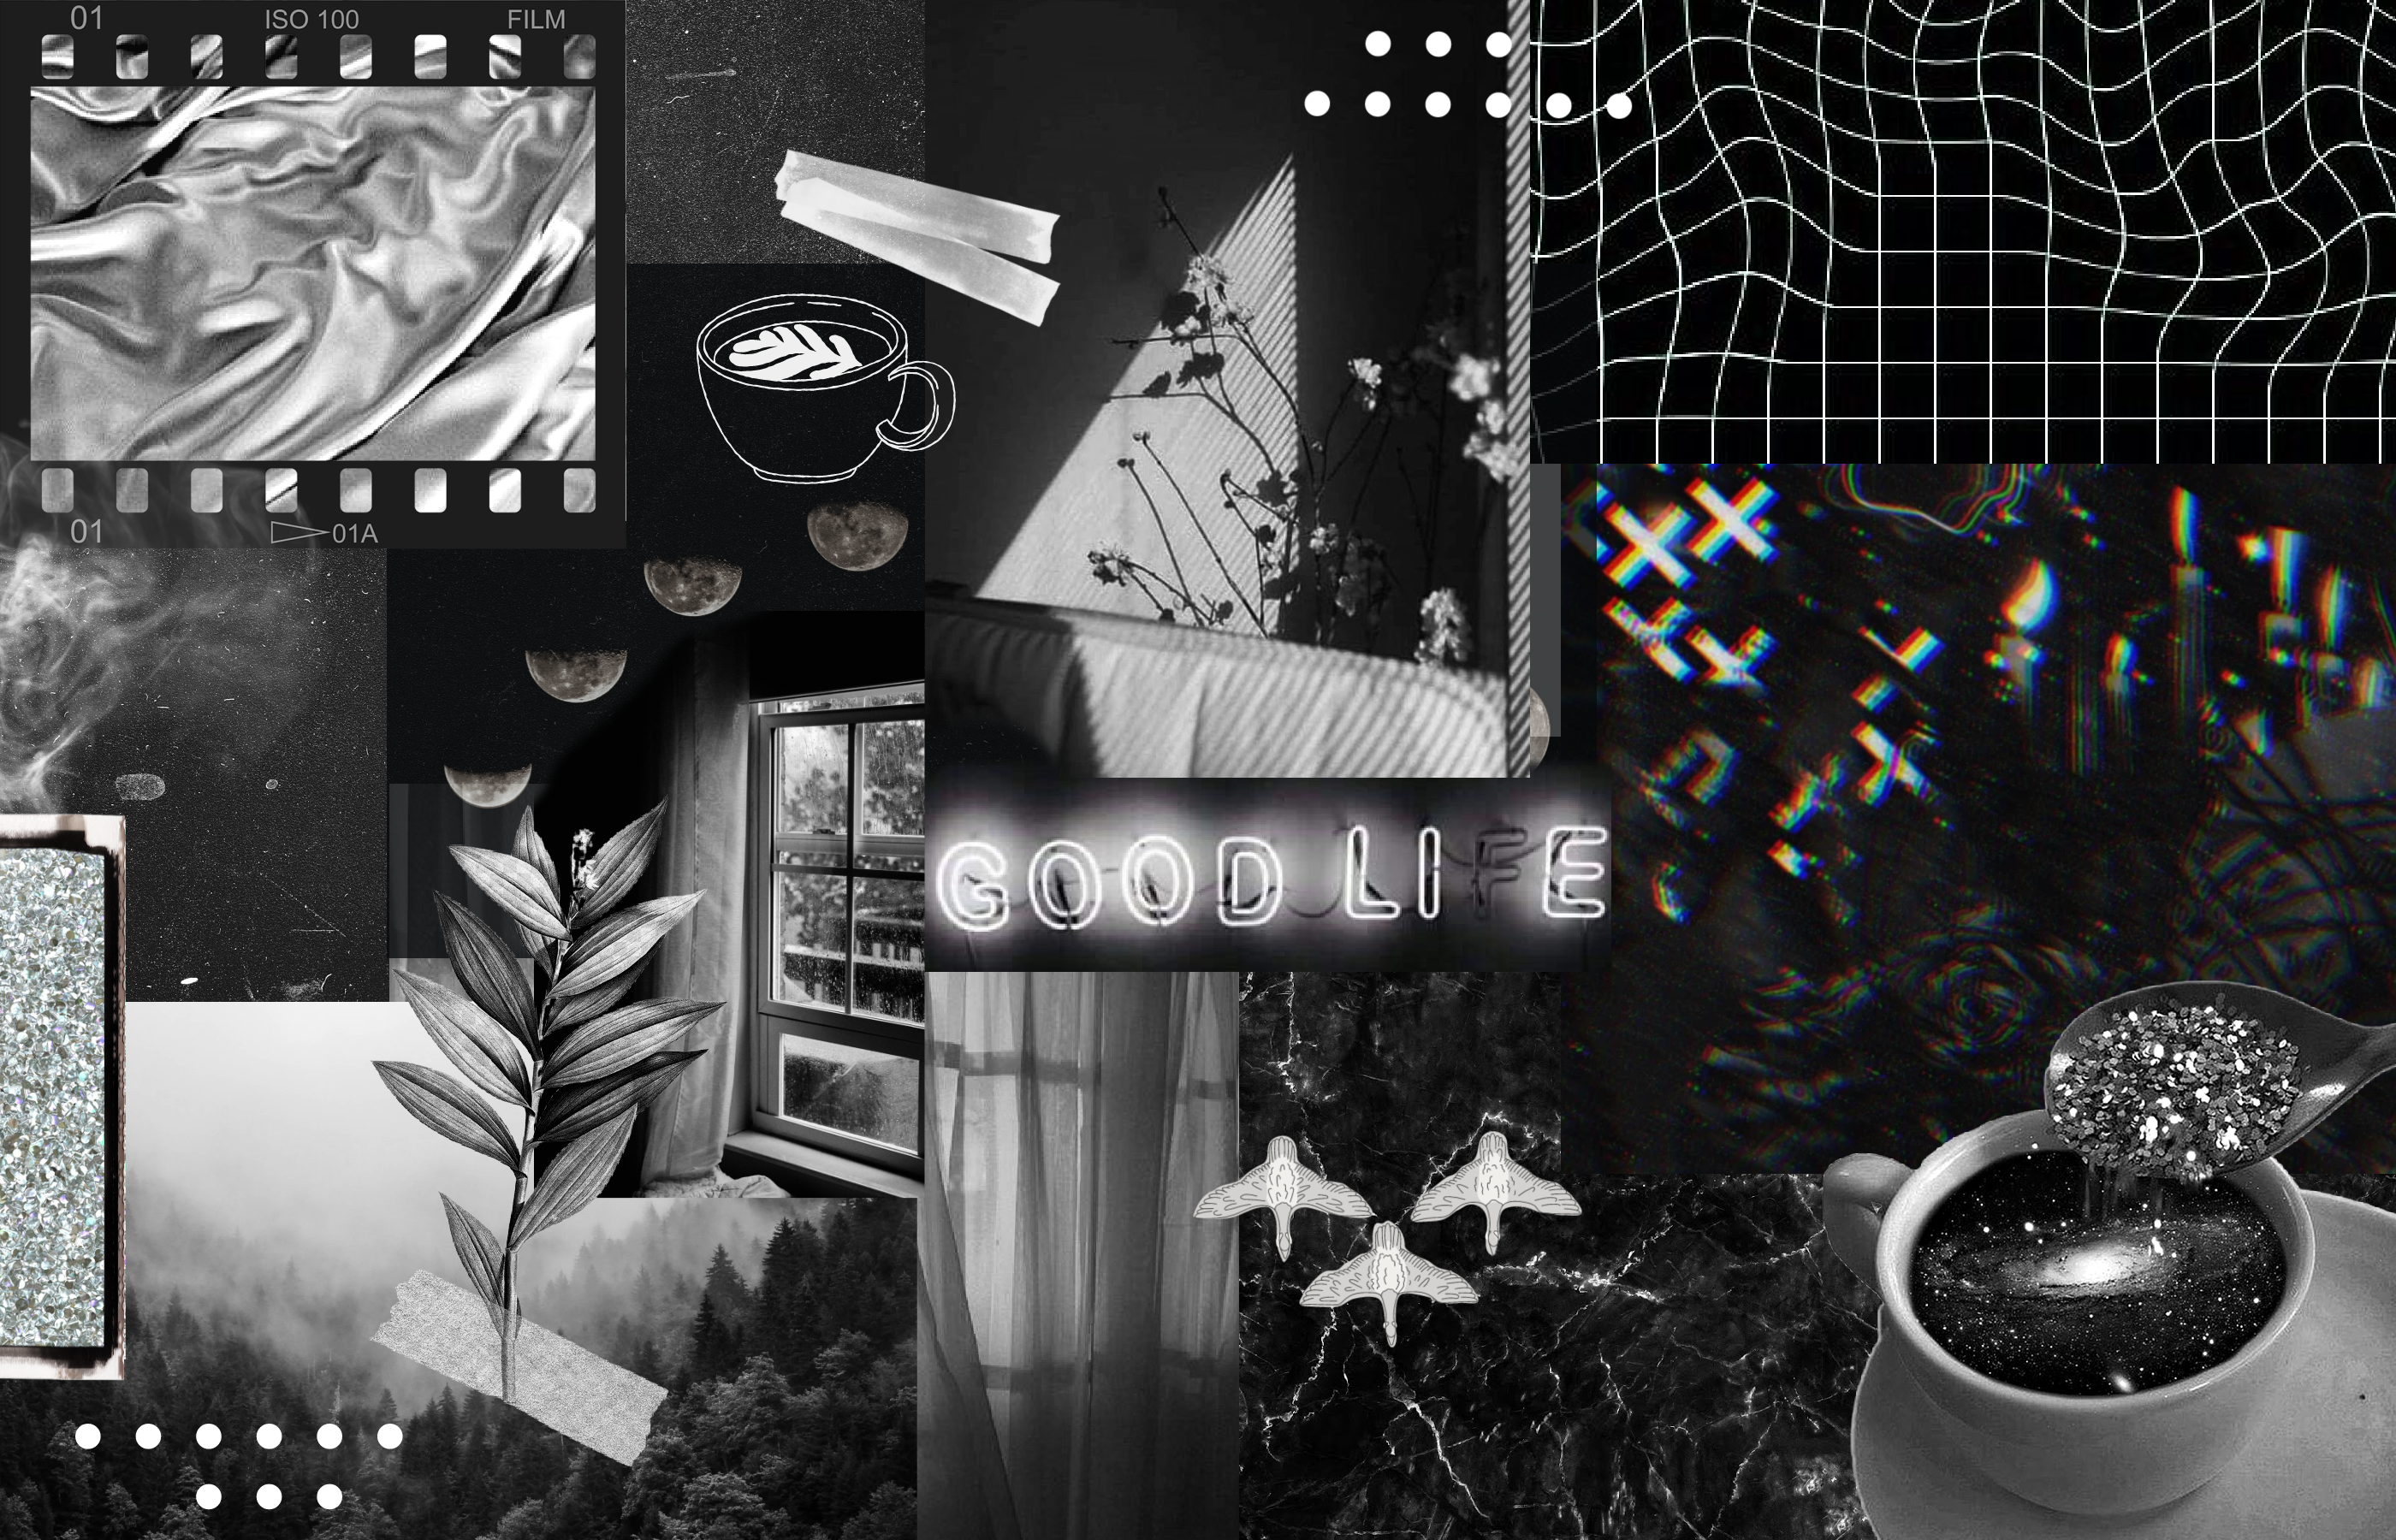 macbook black aesthetic collage background screensaver free